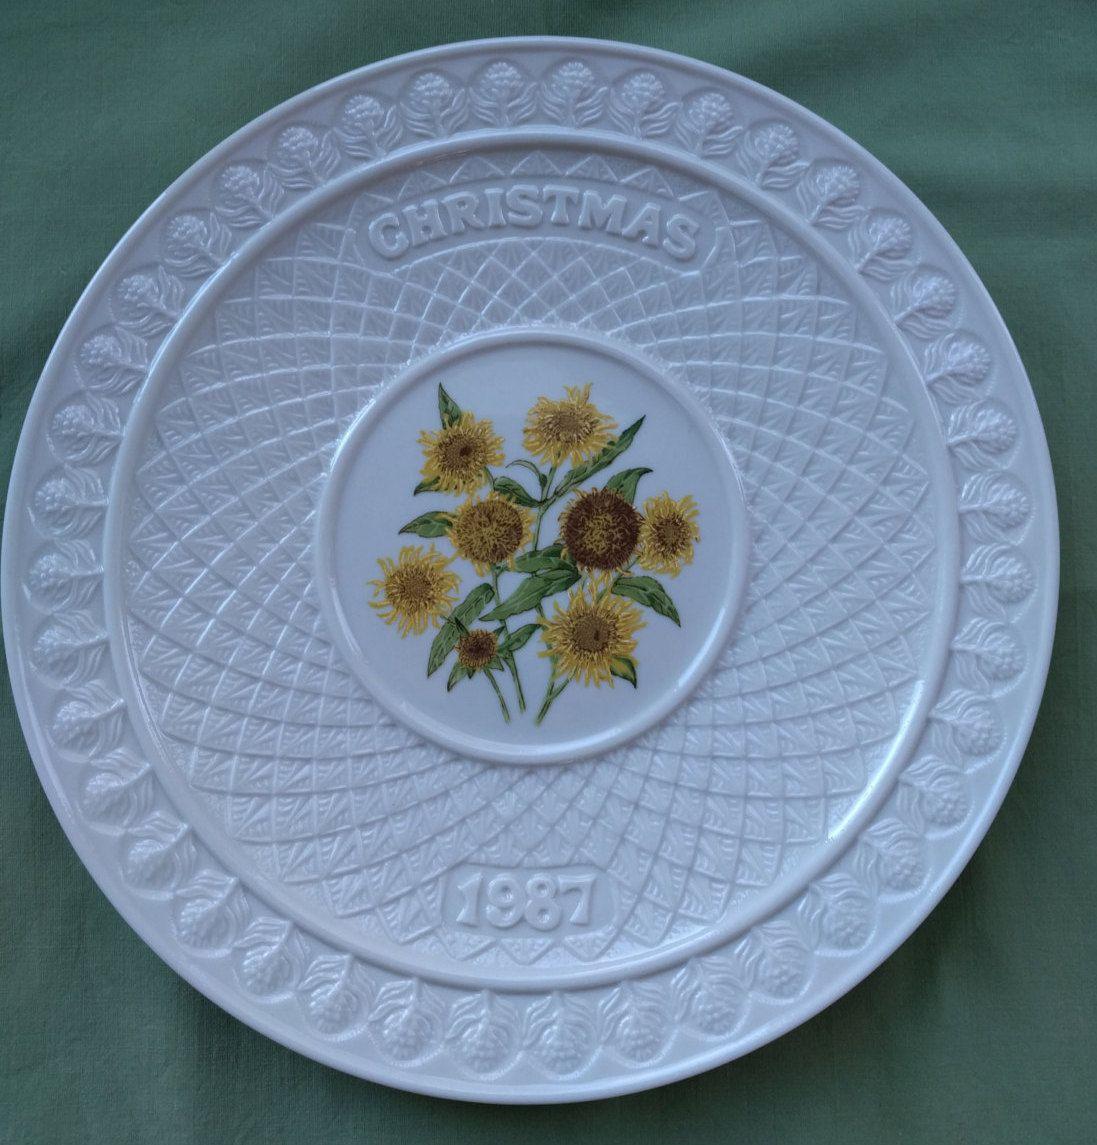 Irish Belleek Christmas Plate Vintage Porcelain Collectible 7th Mark Gold 1987 Sunflowers Christmas Plates Belleek Plates